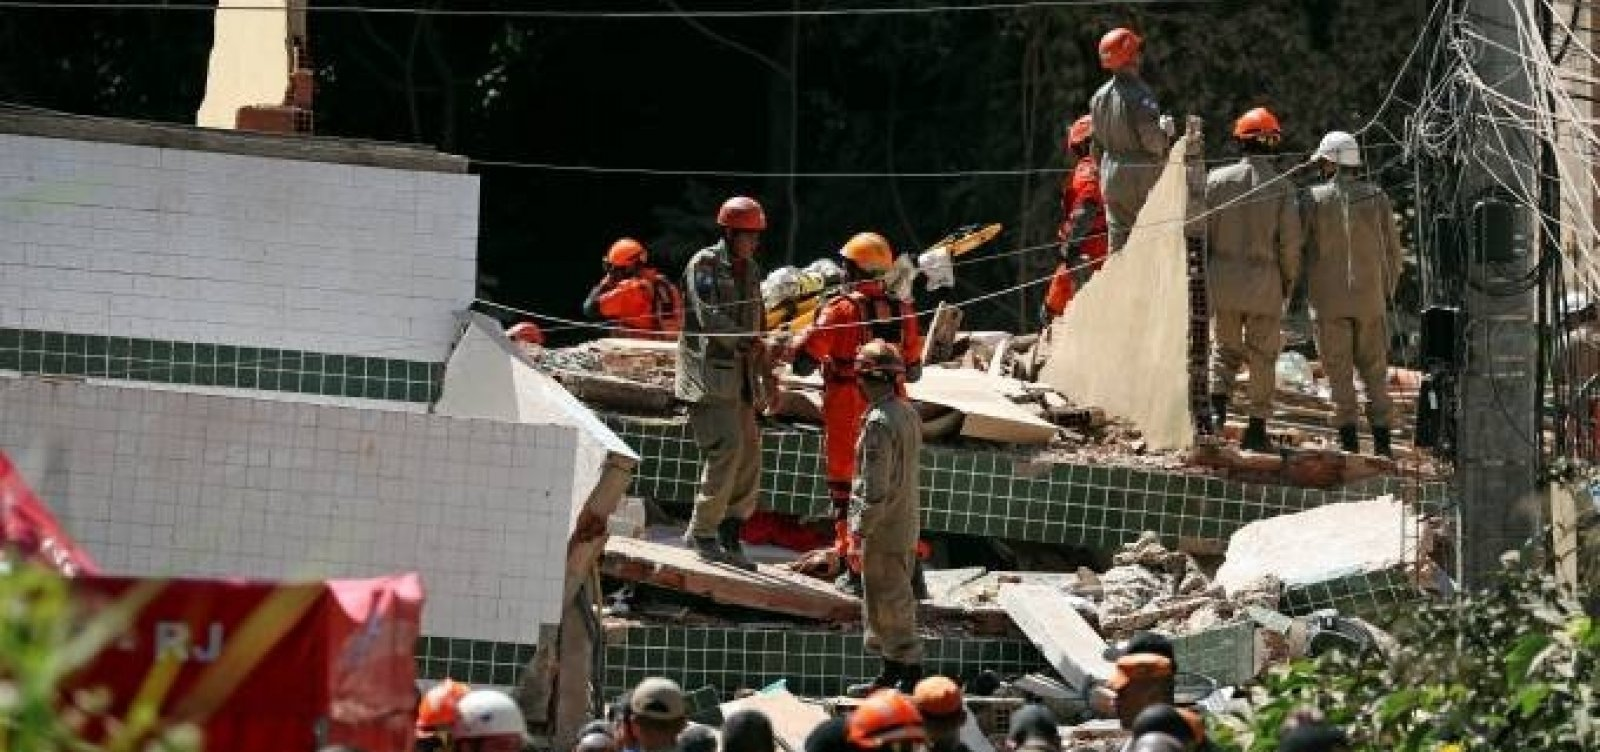 Número de mortos no desabamento no Rio sobre para 18